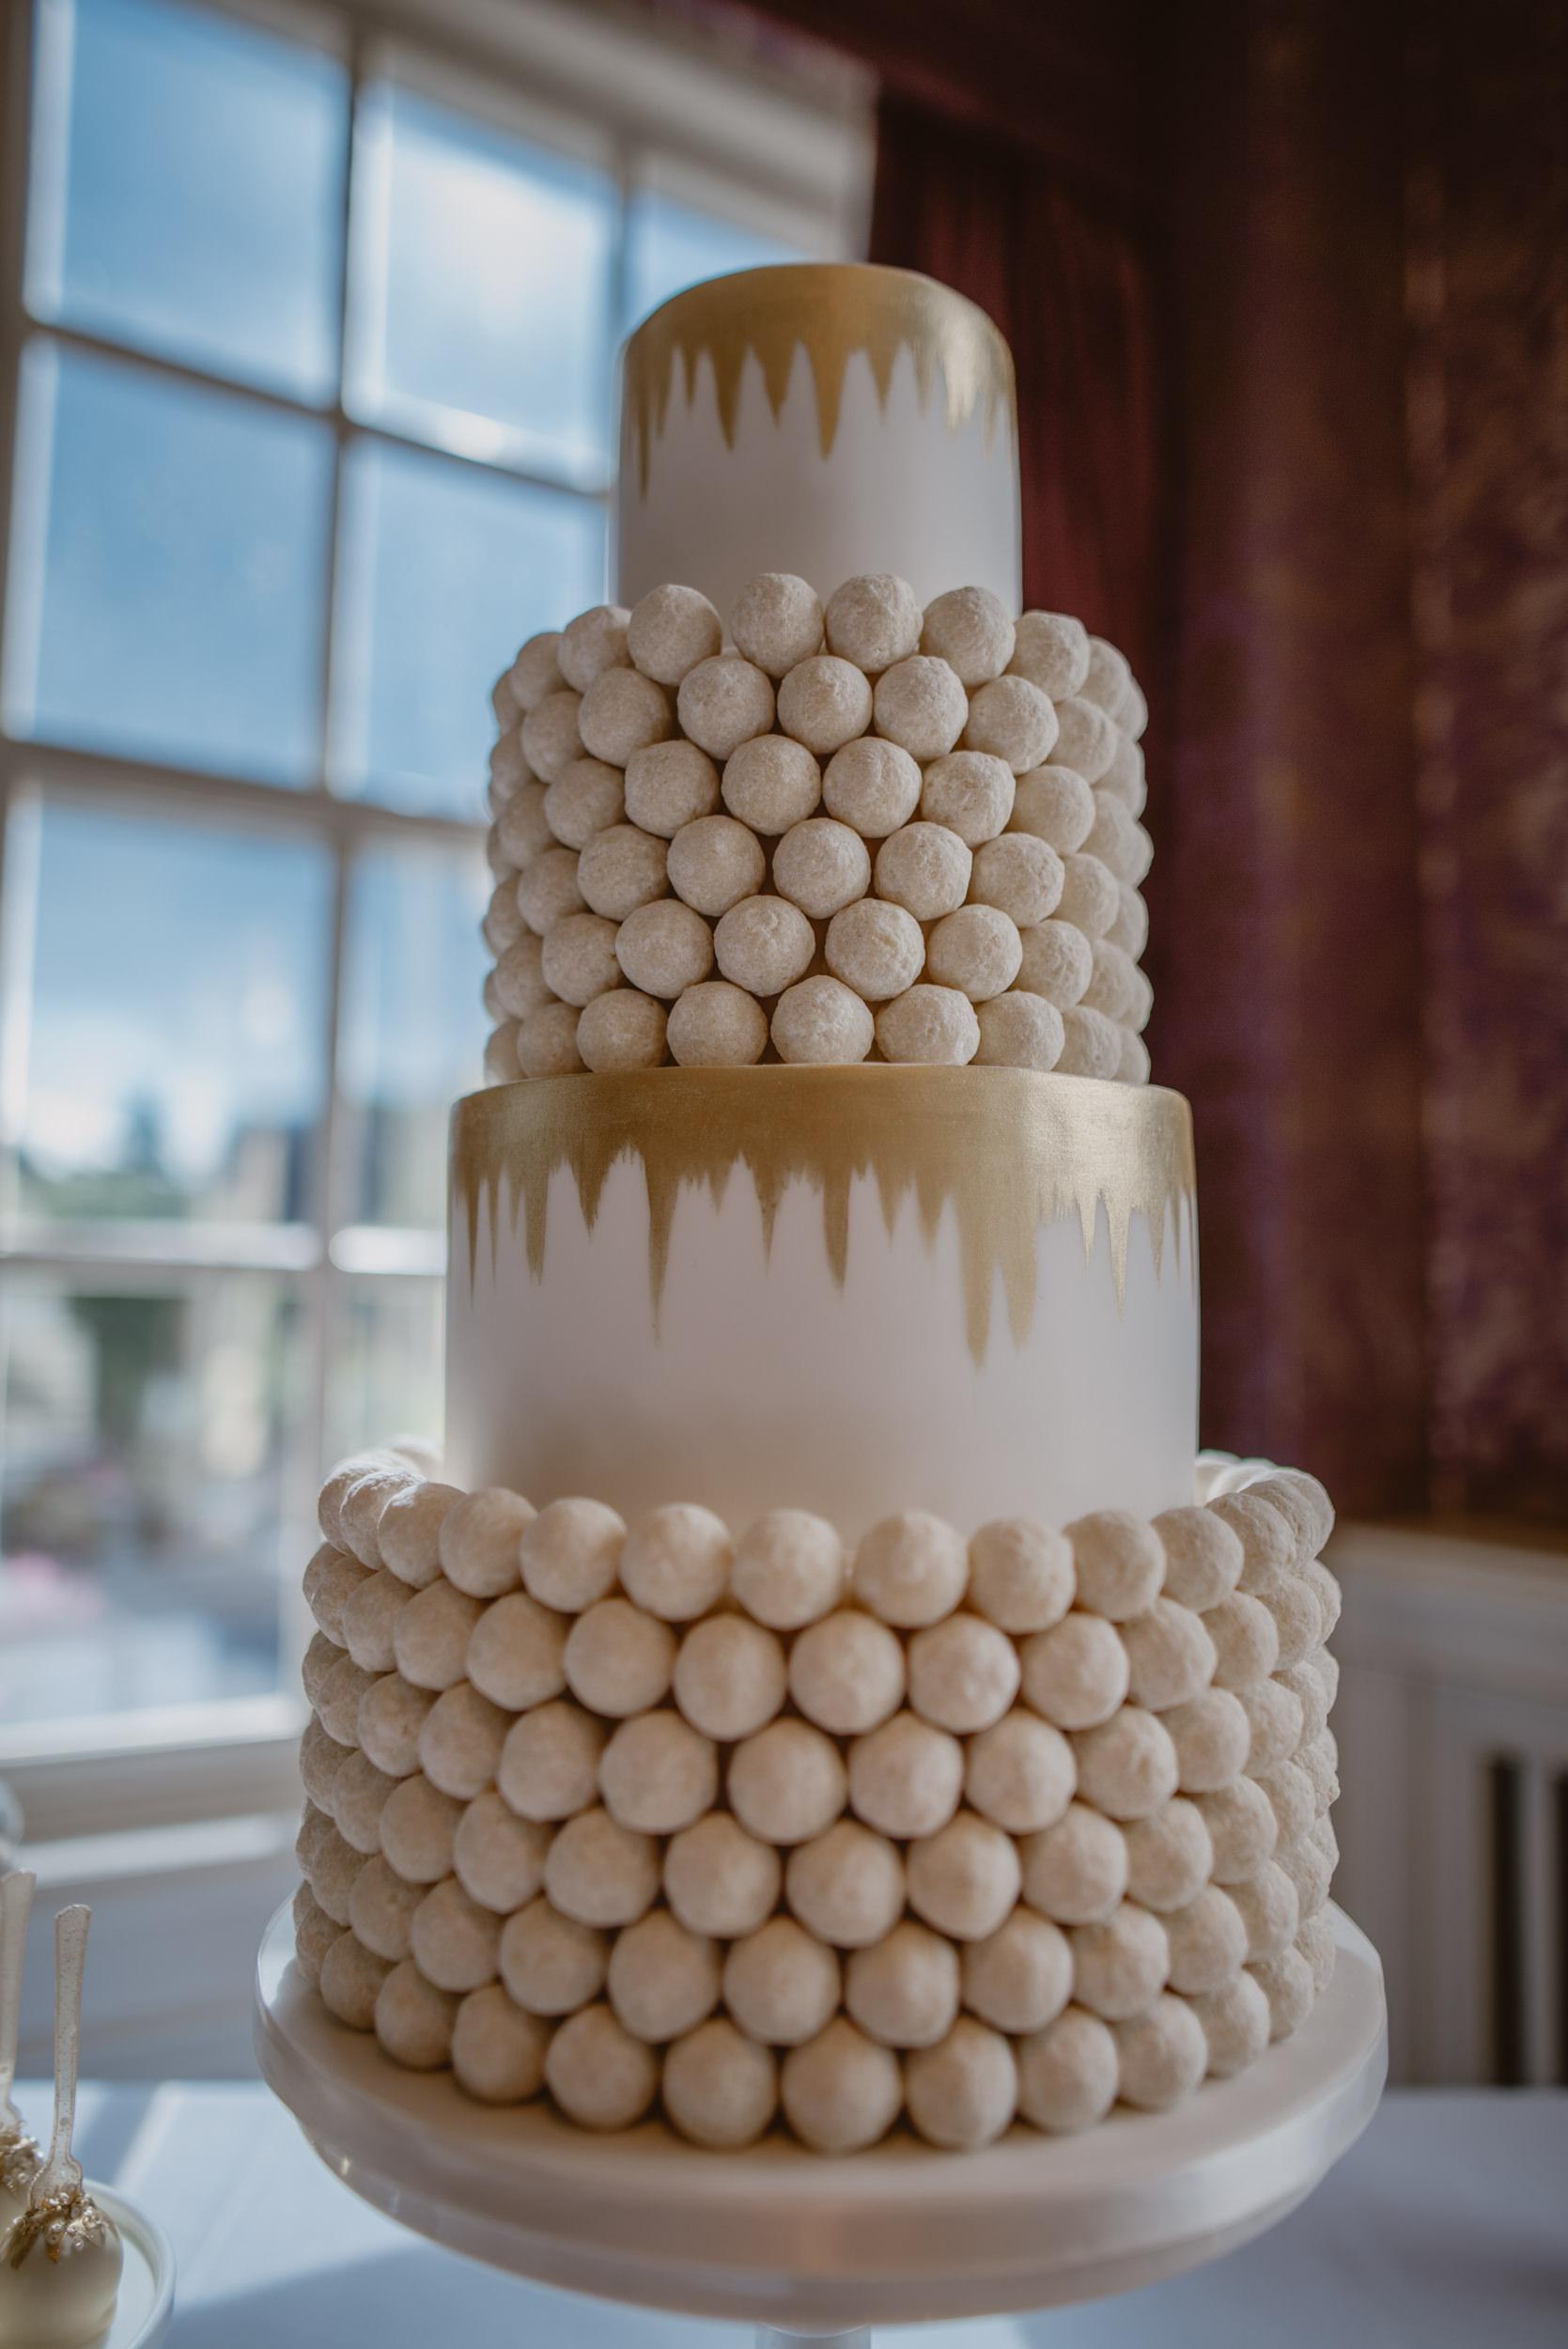 Trisha-and-Roger-wedding-The-Priory-Church-and-Chewton-Glen-Hotel-Christchurch-Manu-Mendoza-Wedding-Photography-260.jpg